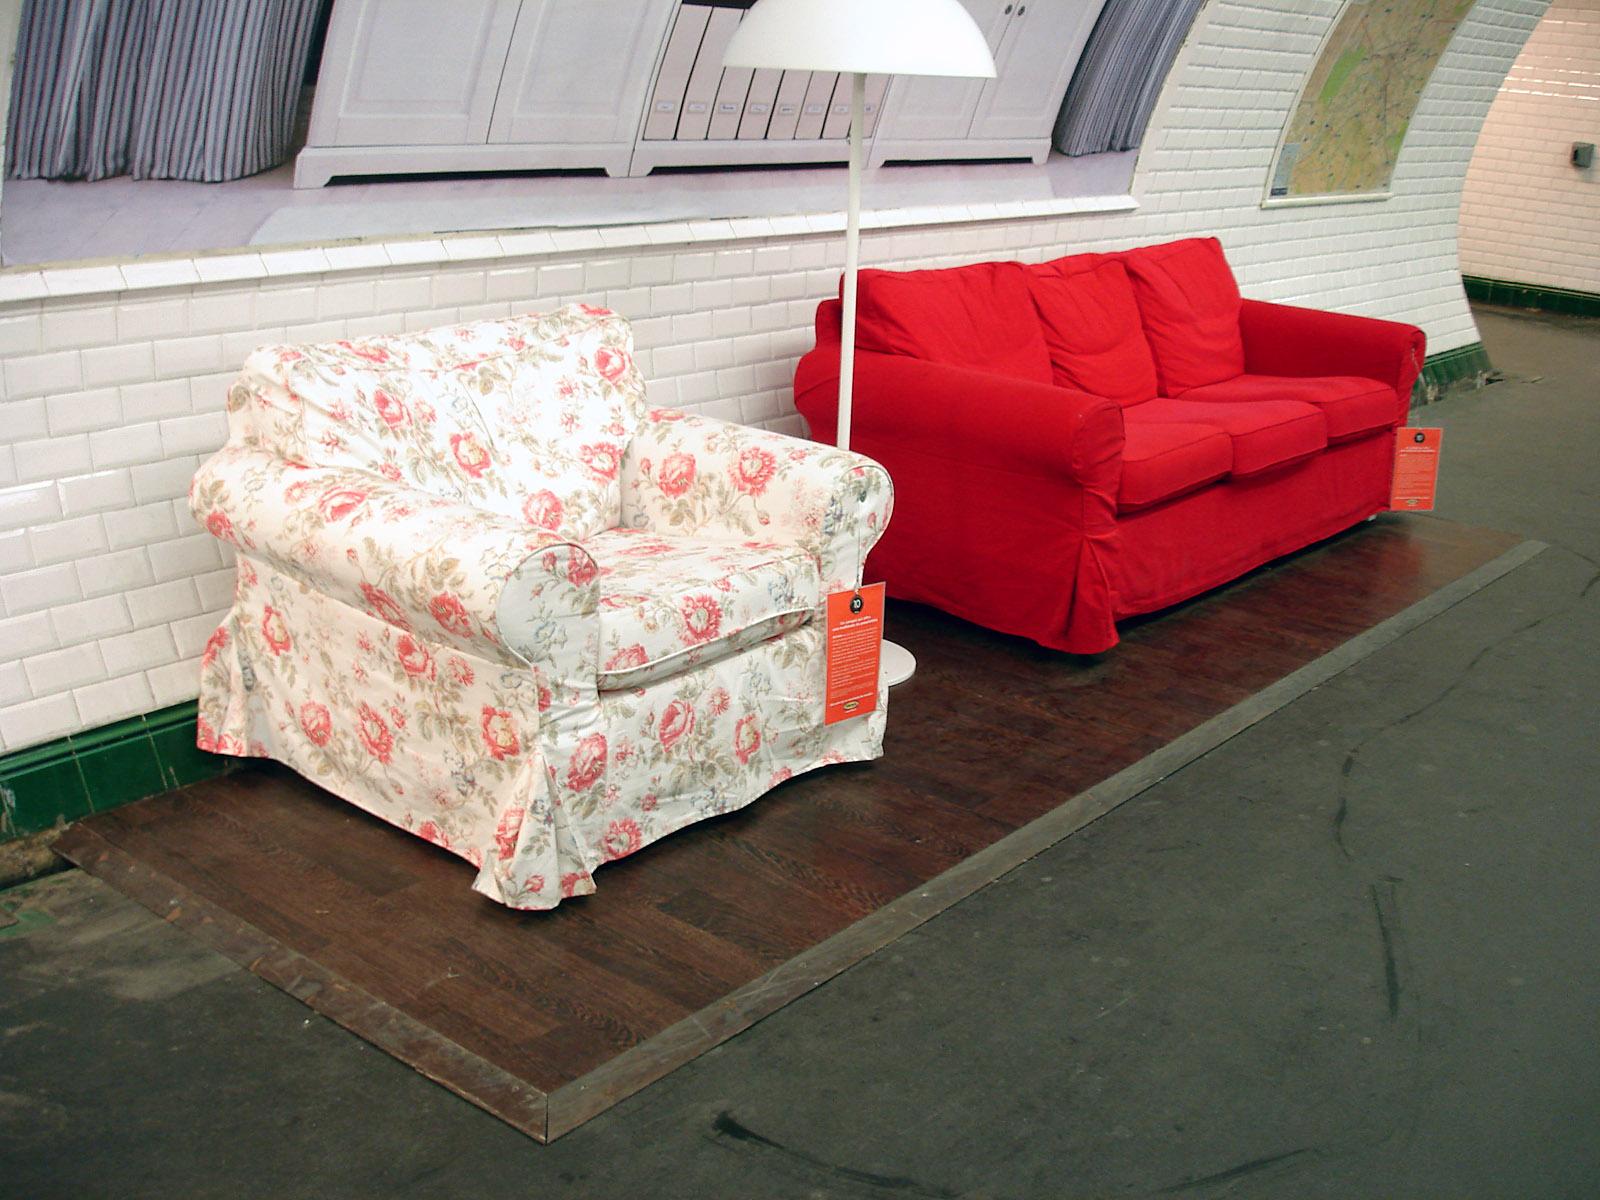 ligne de metro opera subway application. Black Bedroom Furniture Sets. Home Design Ideas